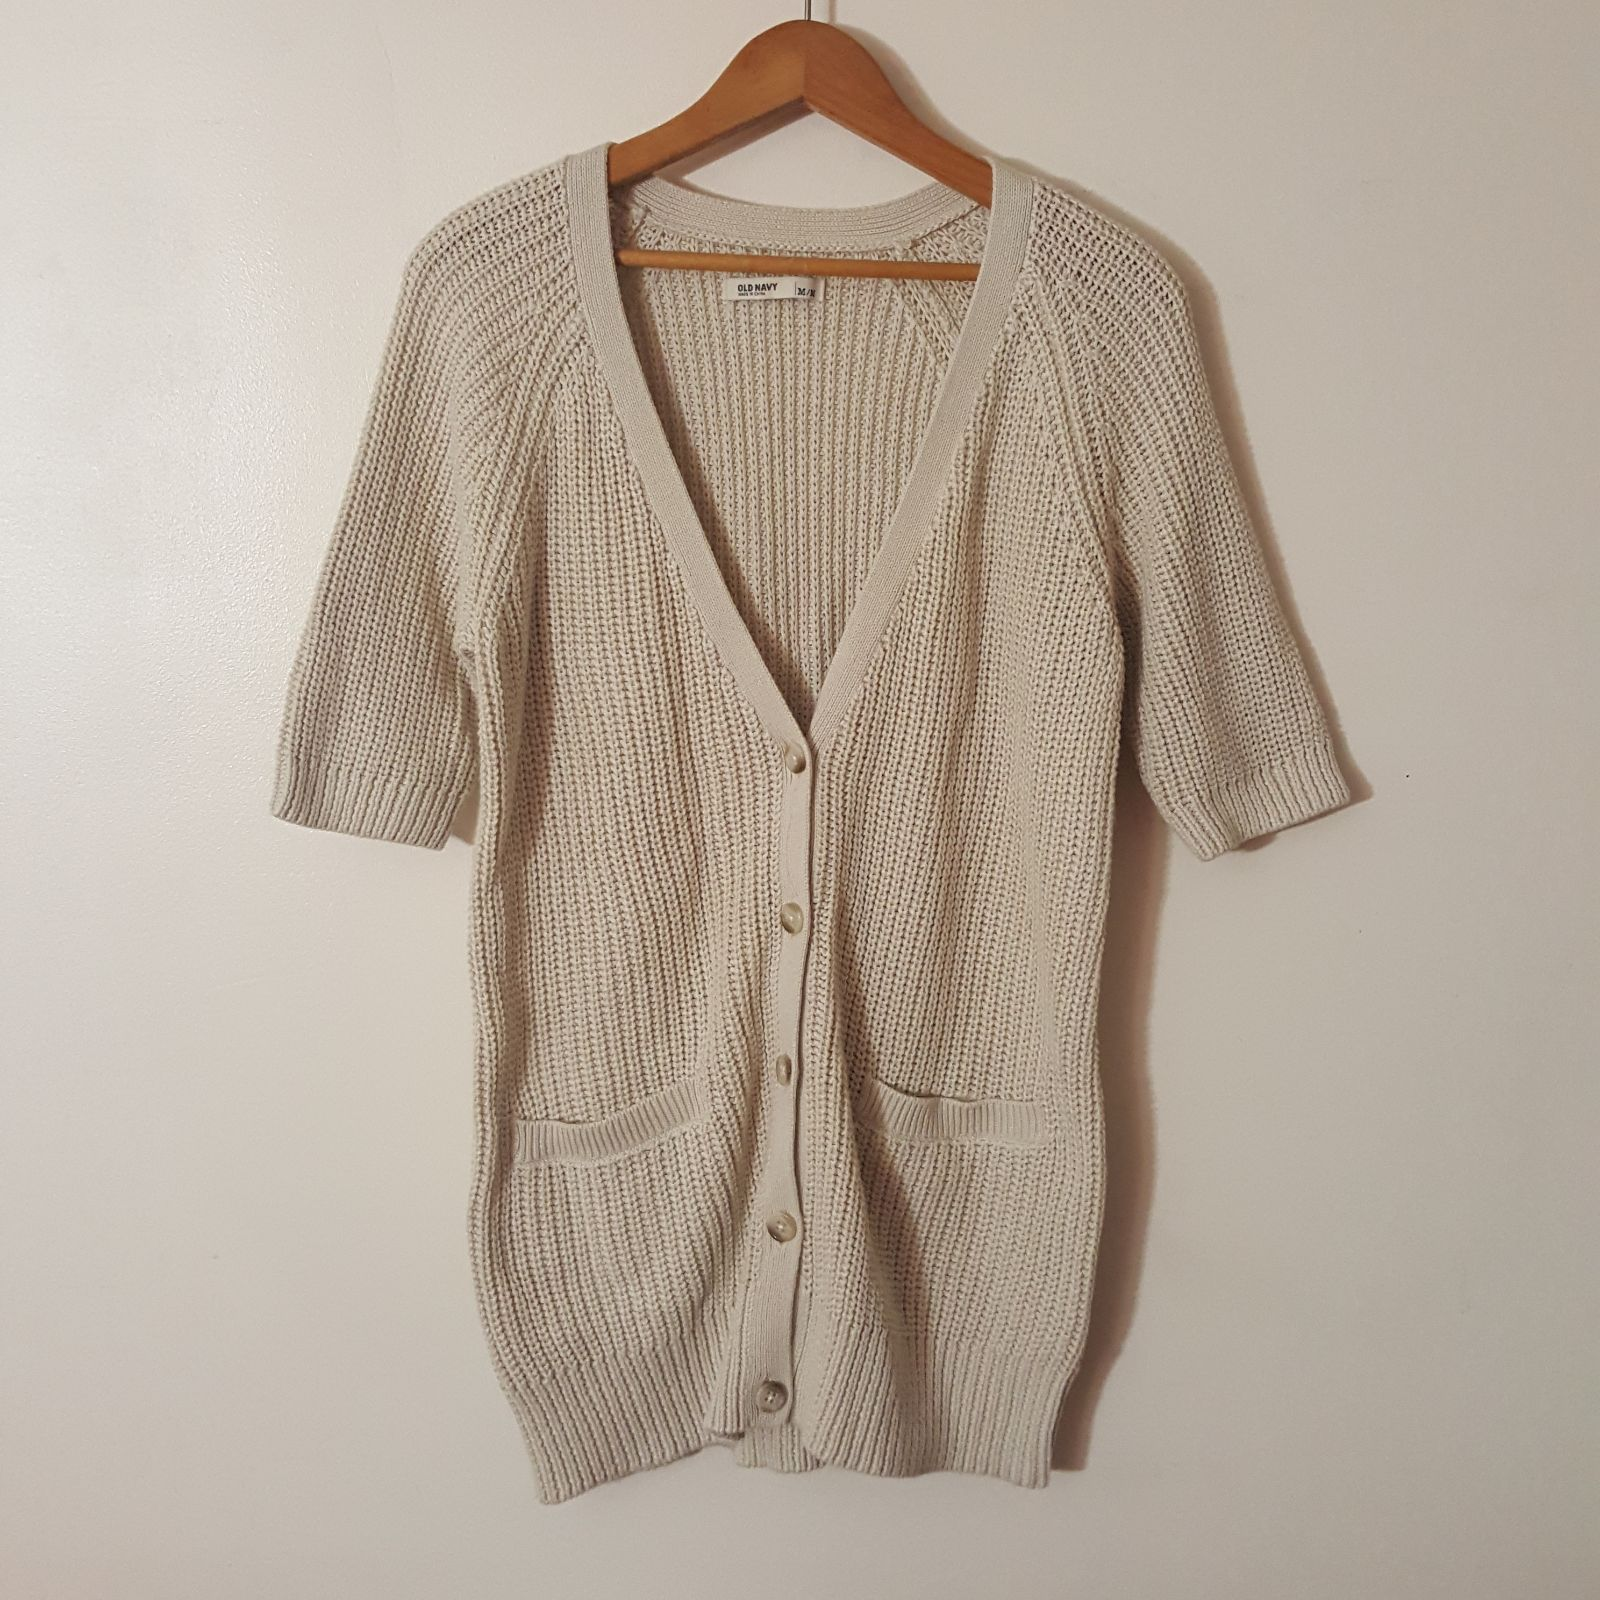 nwt|・old navy long cardigan・ - Mercari: BUY & SELL THINGS YOU LOVE